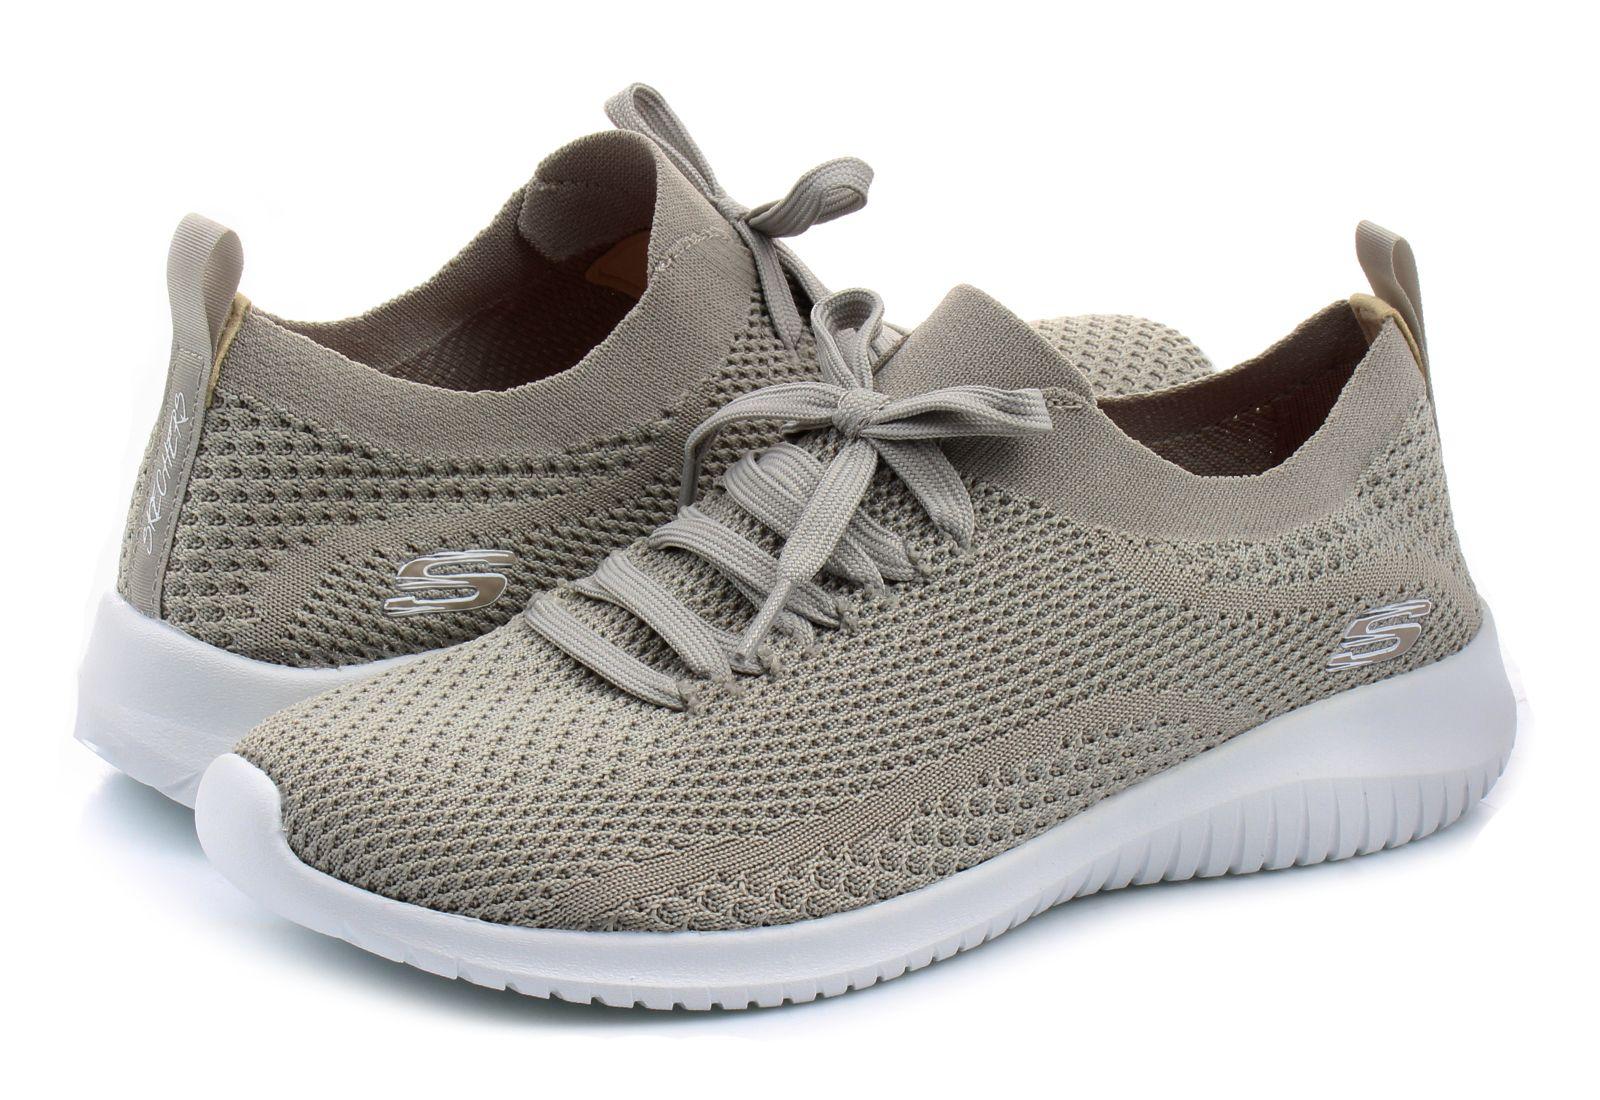 Skechers Cipo Ultra Flex 12841 Tpe Office Shoes Magyarorszag